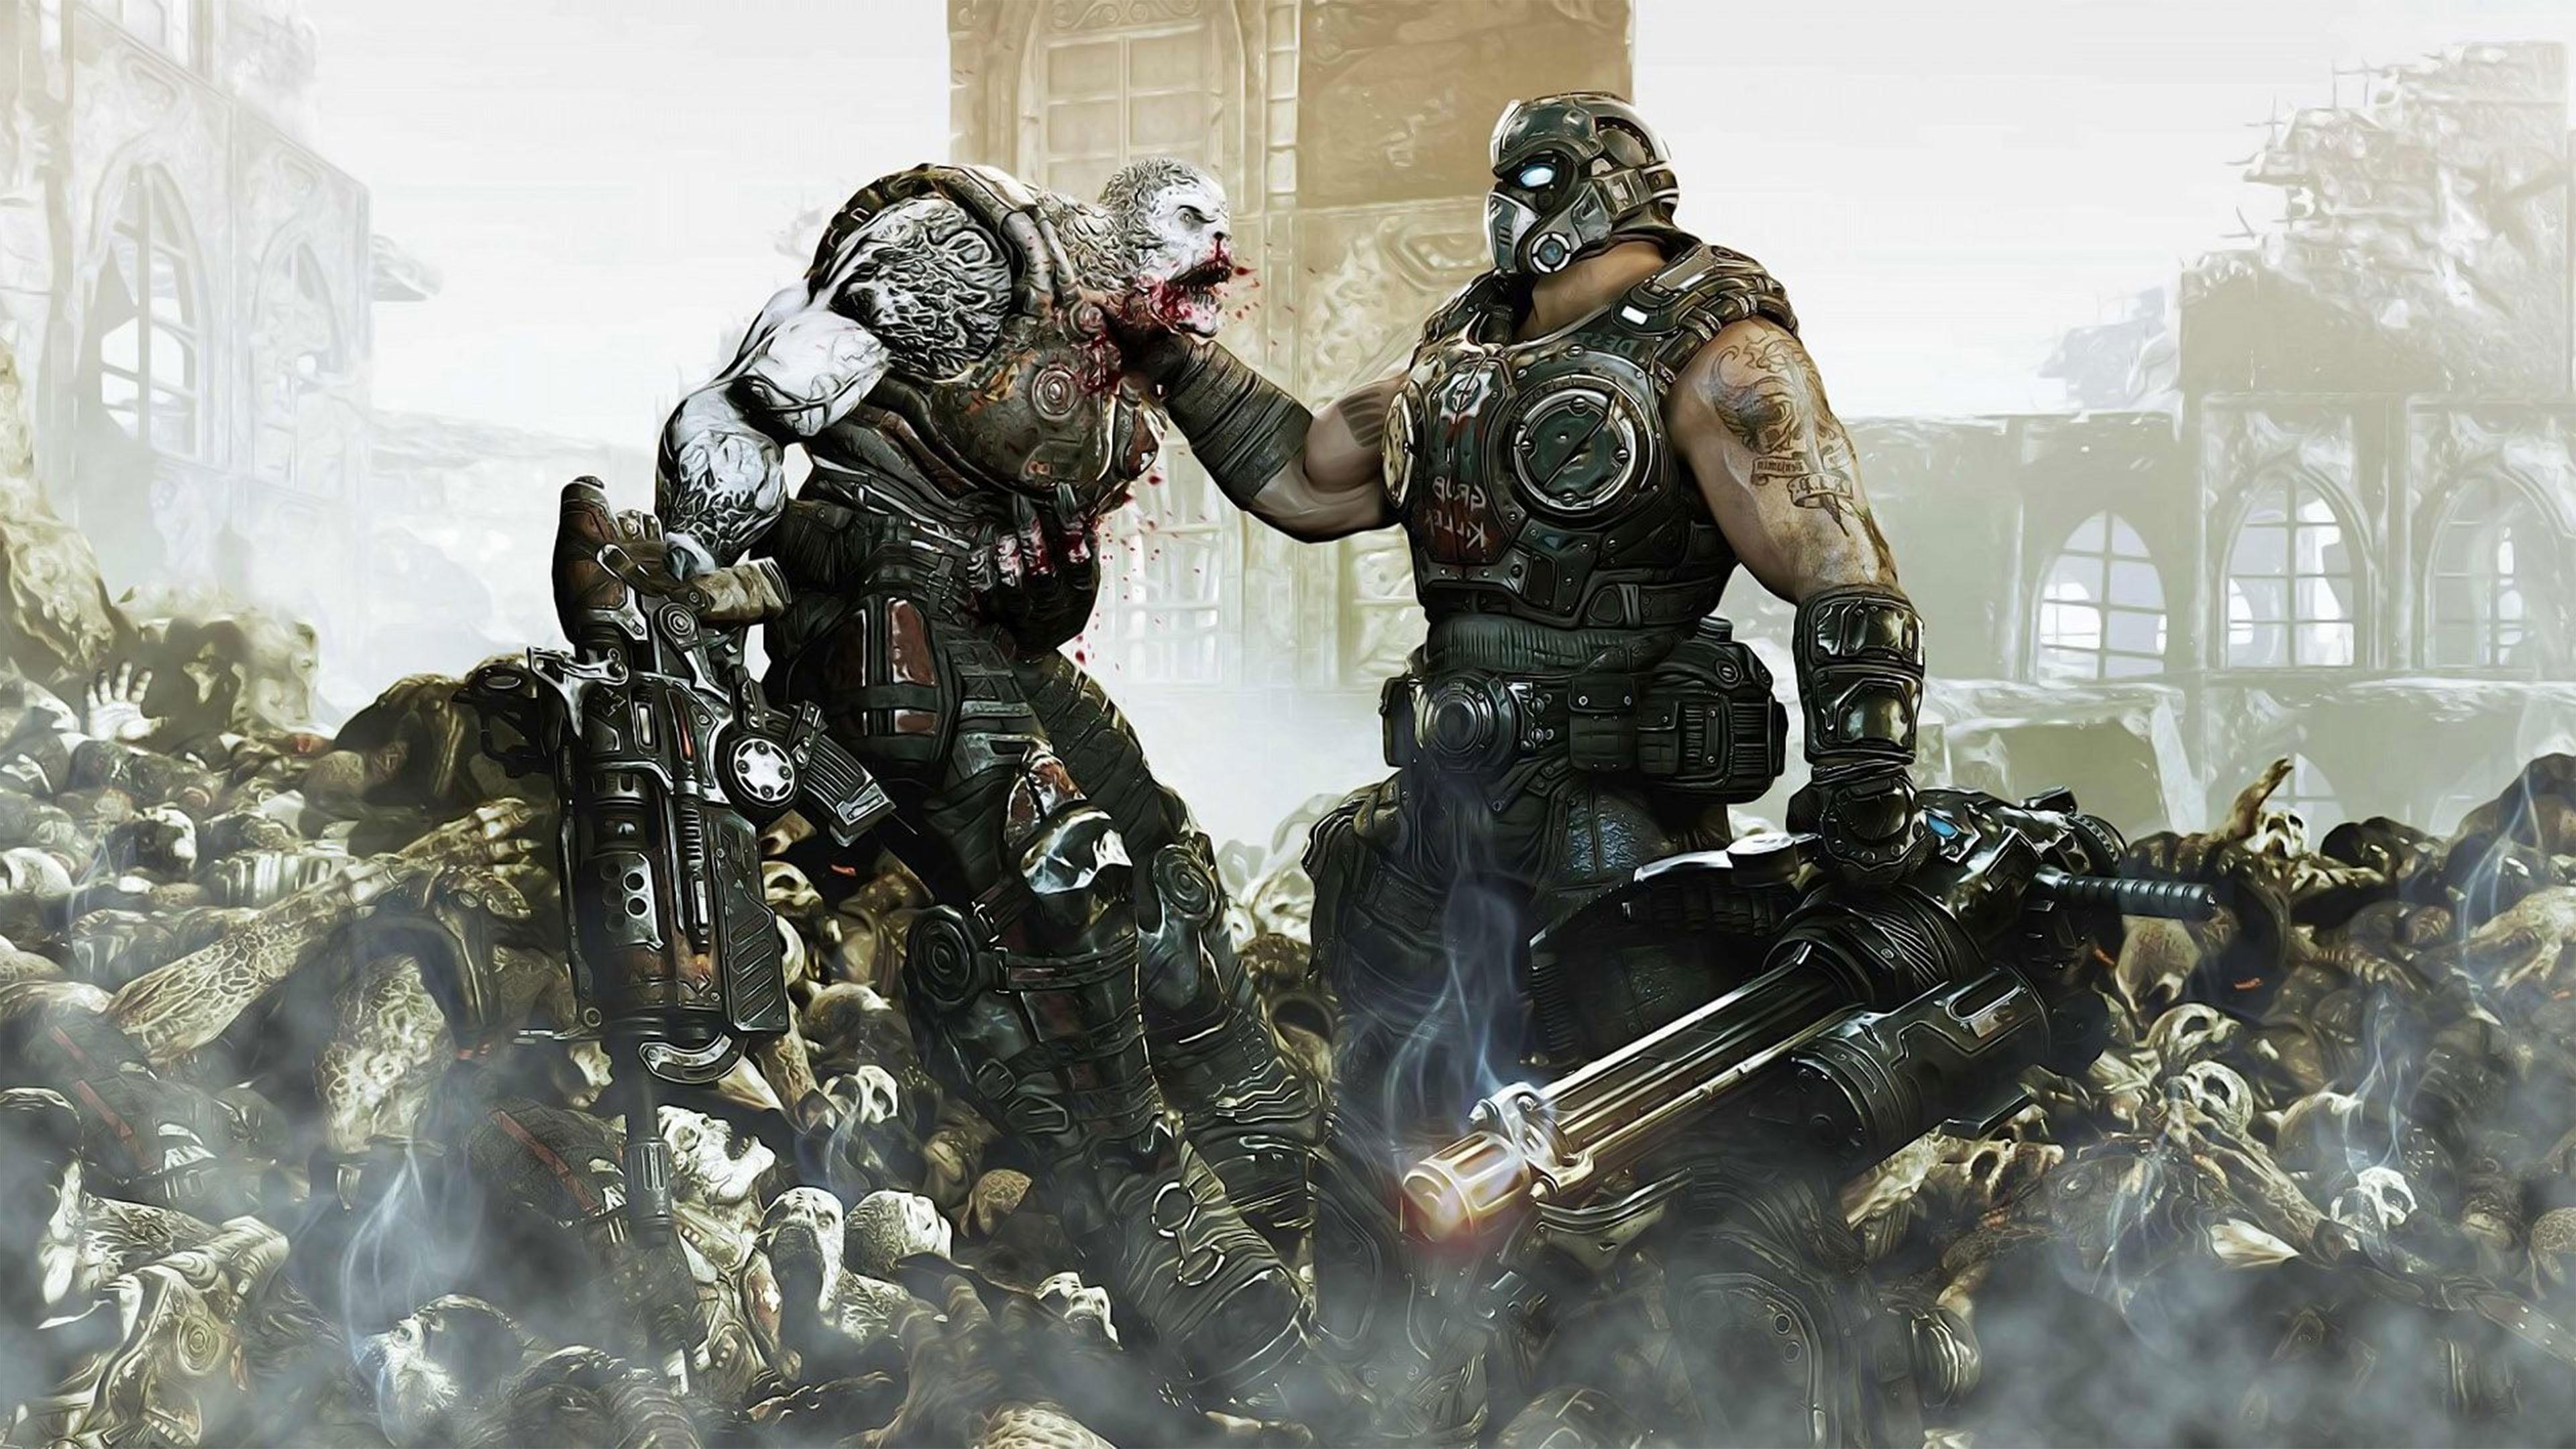 Gears Of War 4 Art - HD Wallpaper